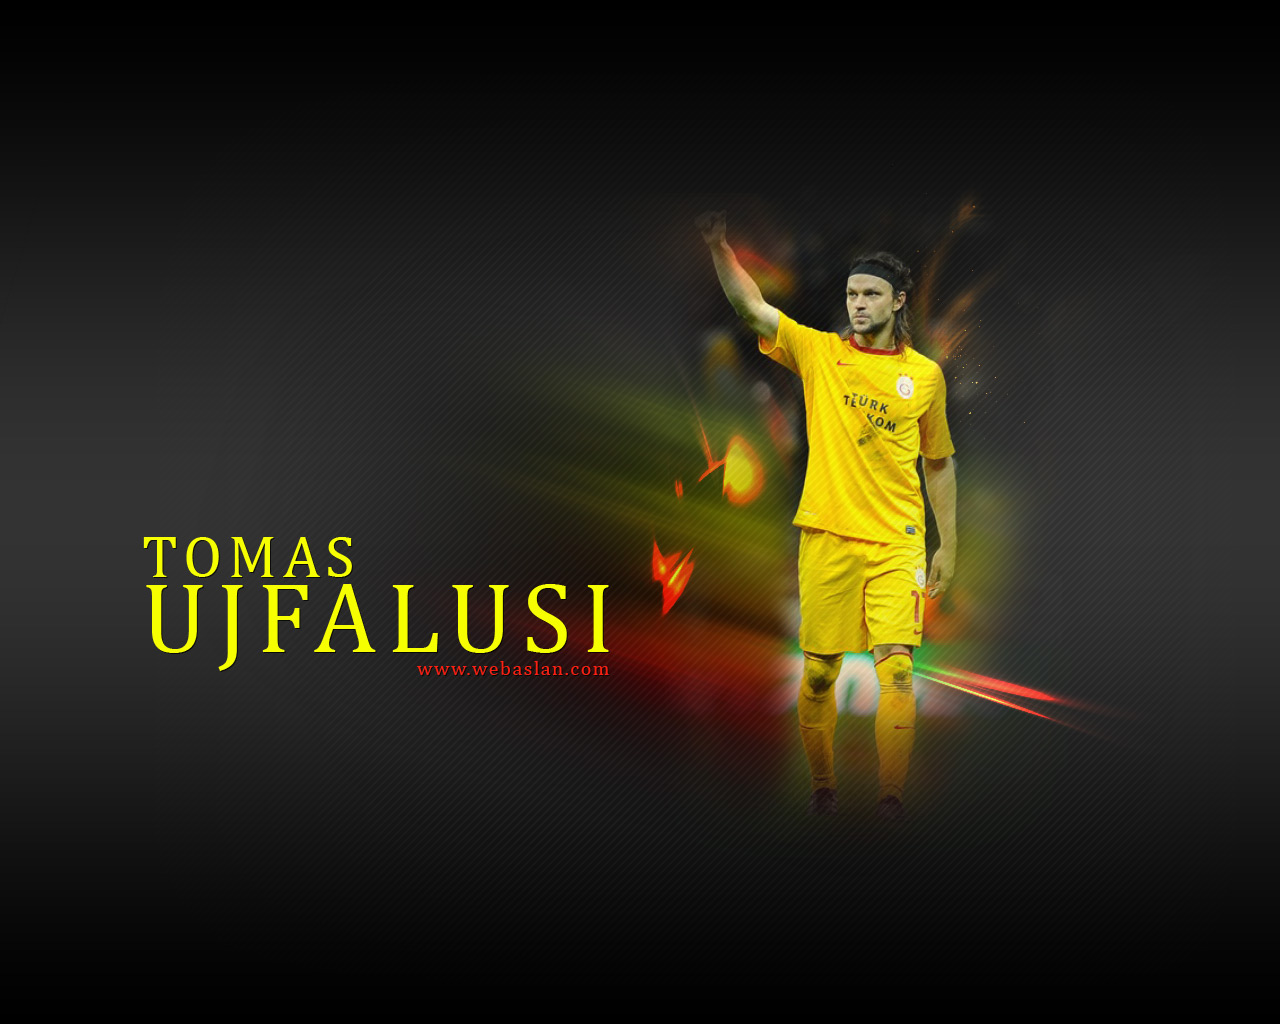 Tomáš Ujfaluši - der tschechische Barbar - Galatasaray SK 2011/2012